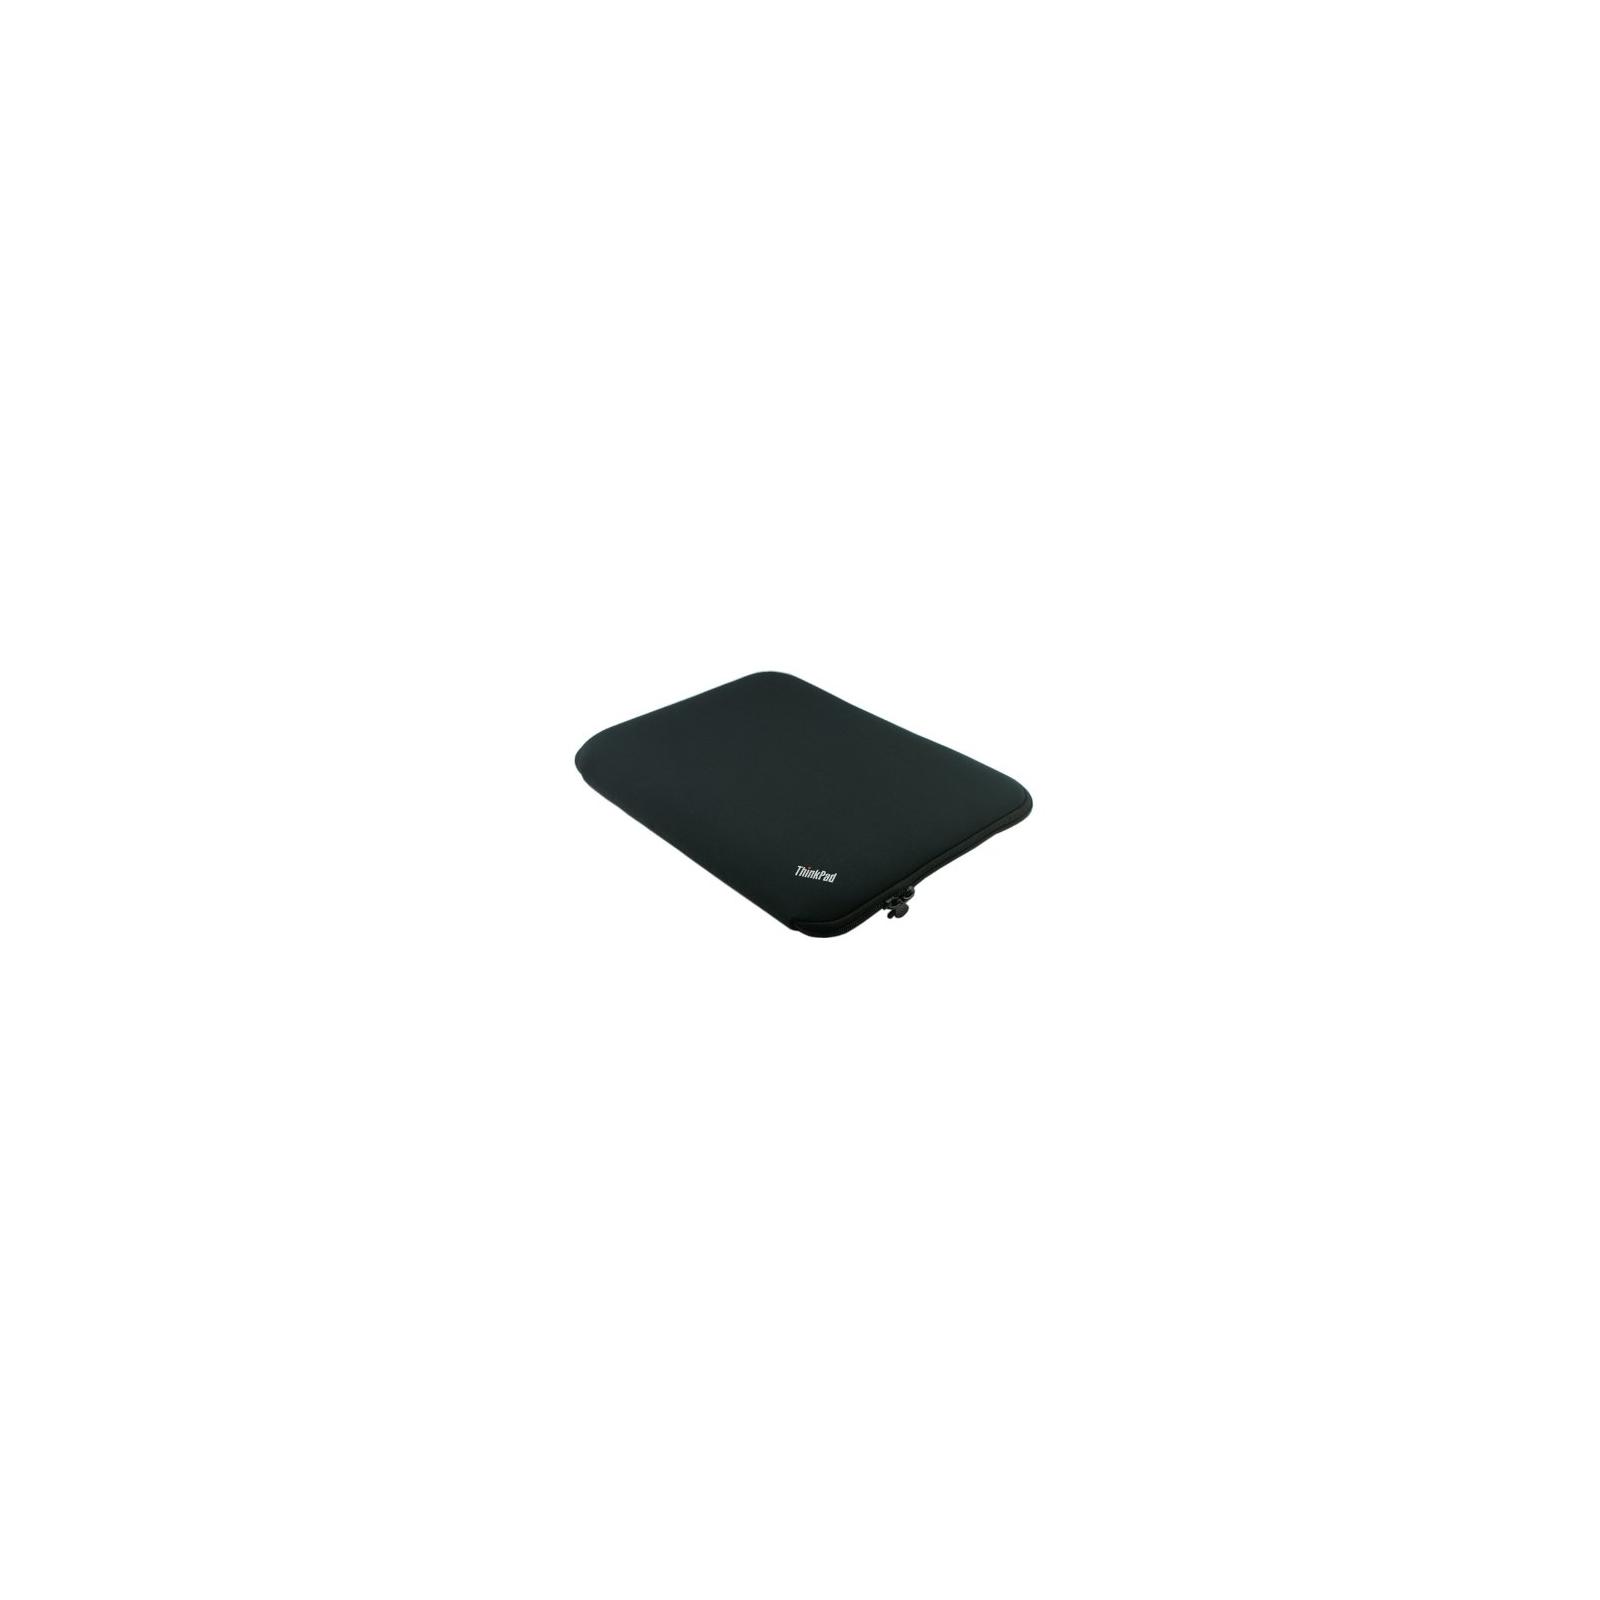 "Чехол для ноутбука Lenovo 15"" ThinkPad Case Sleeve (51J0477) изображение 5"